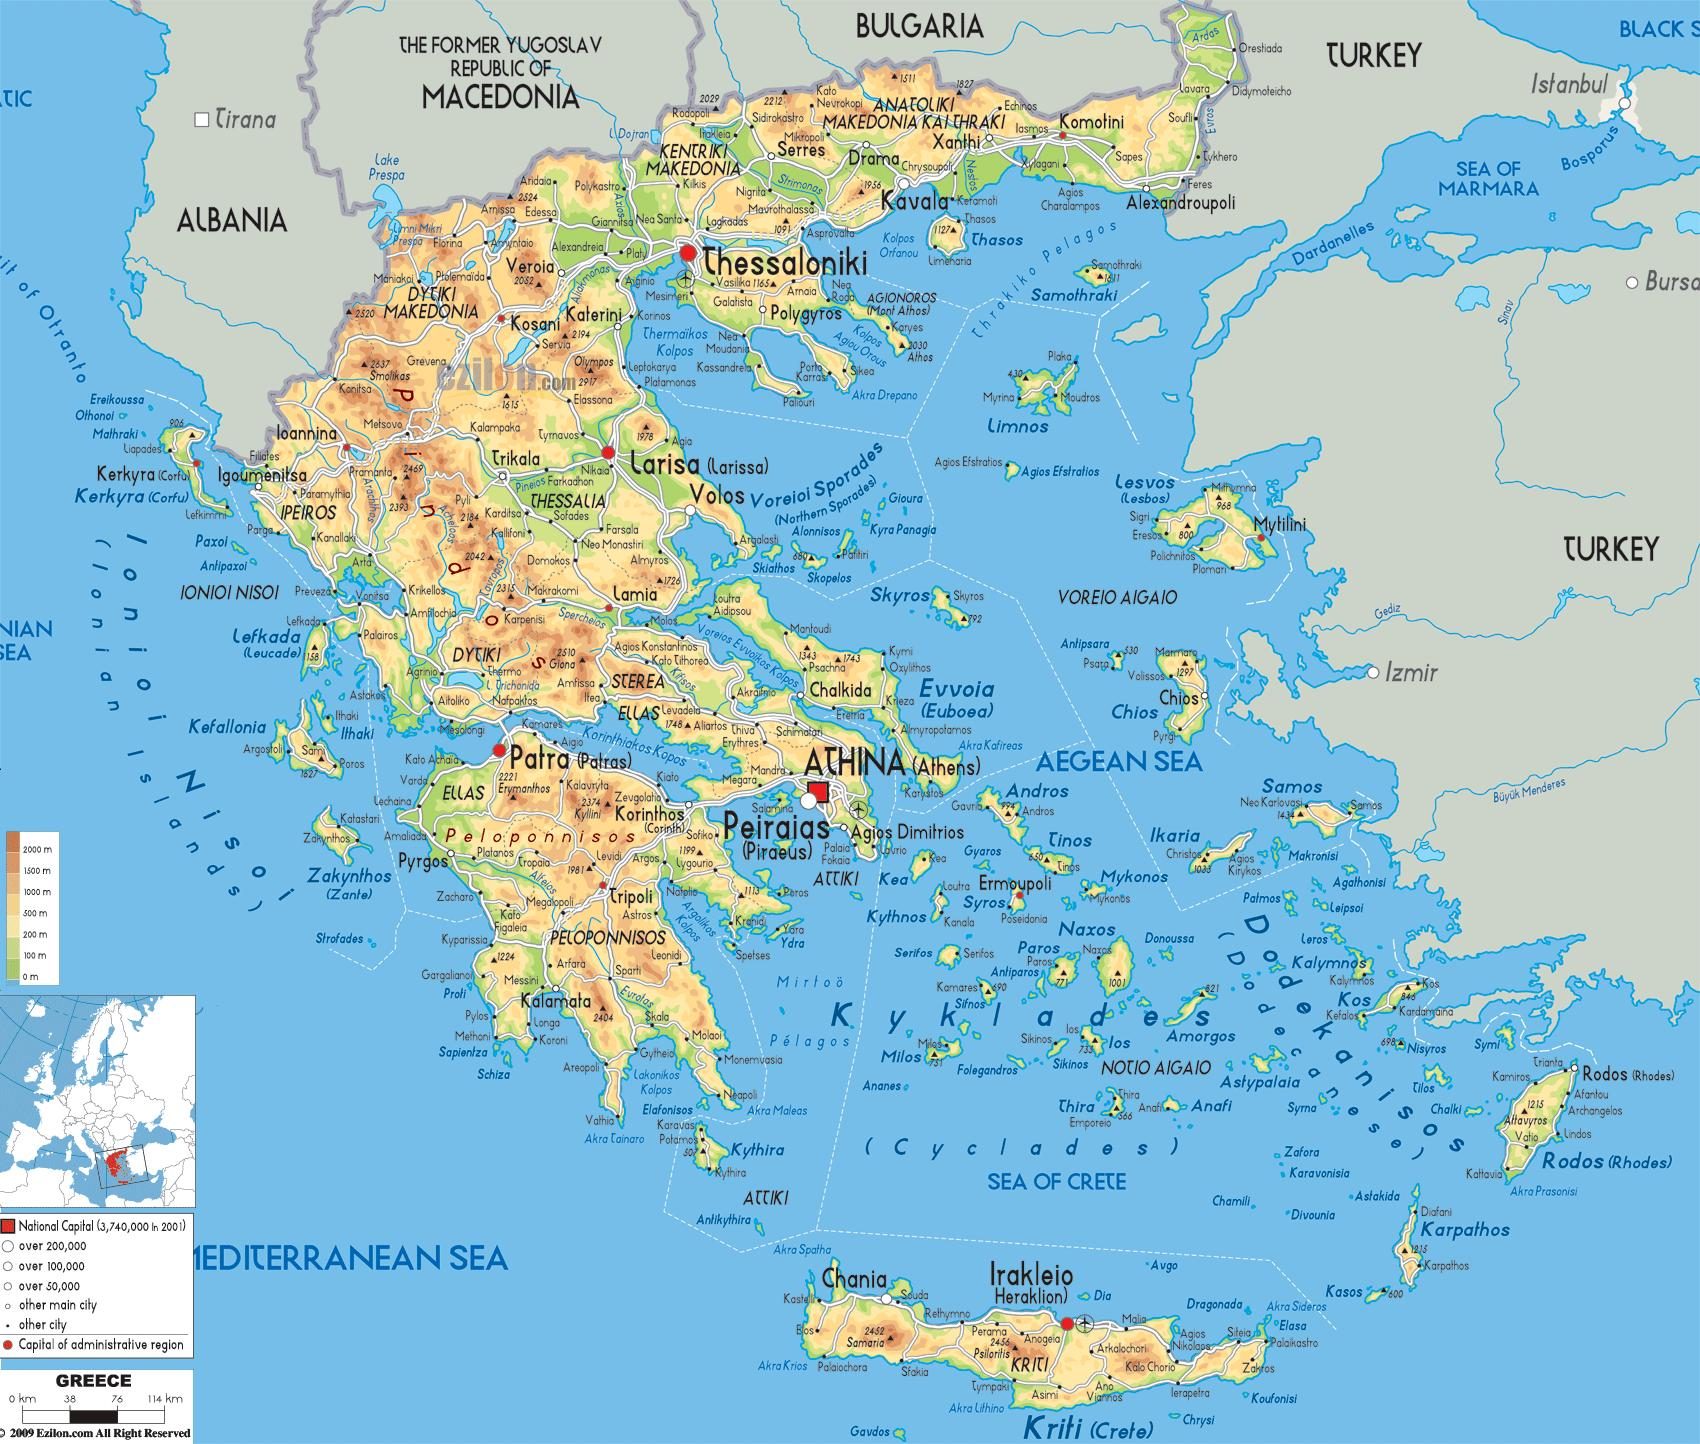 Grcka Geografiju Mapu Geografska Karta Grcka Juznoj Europi